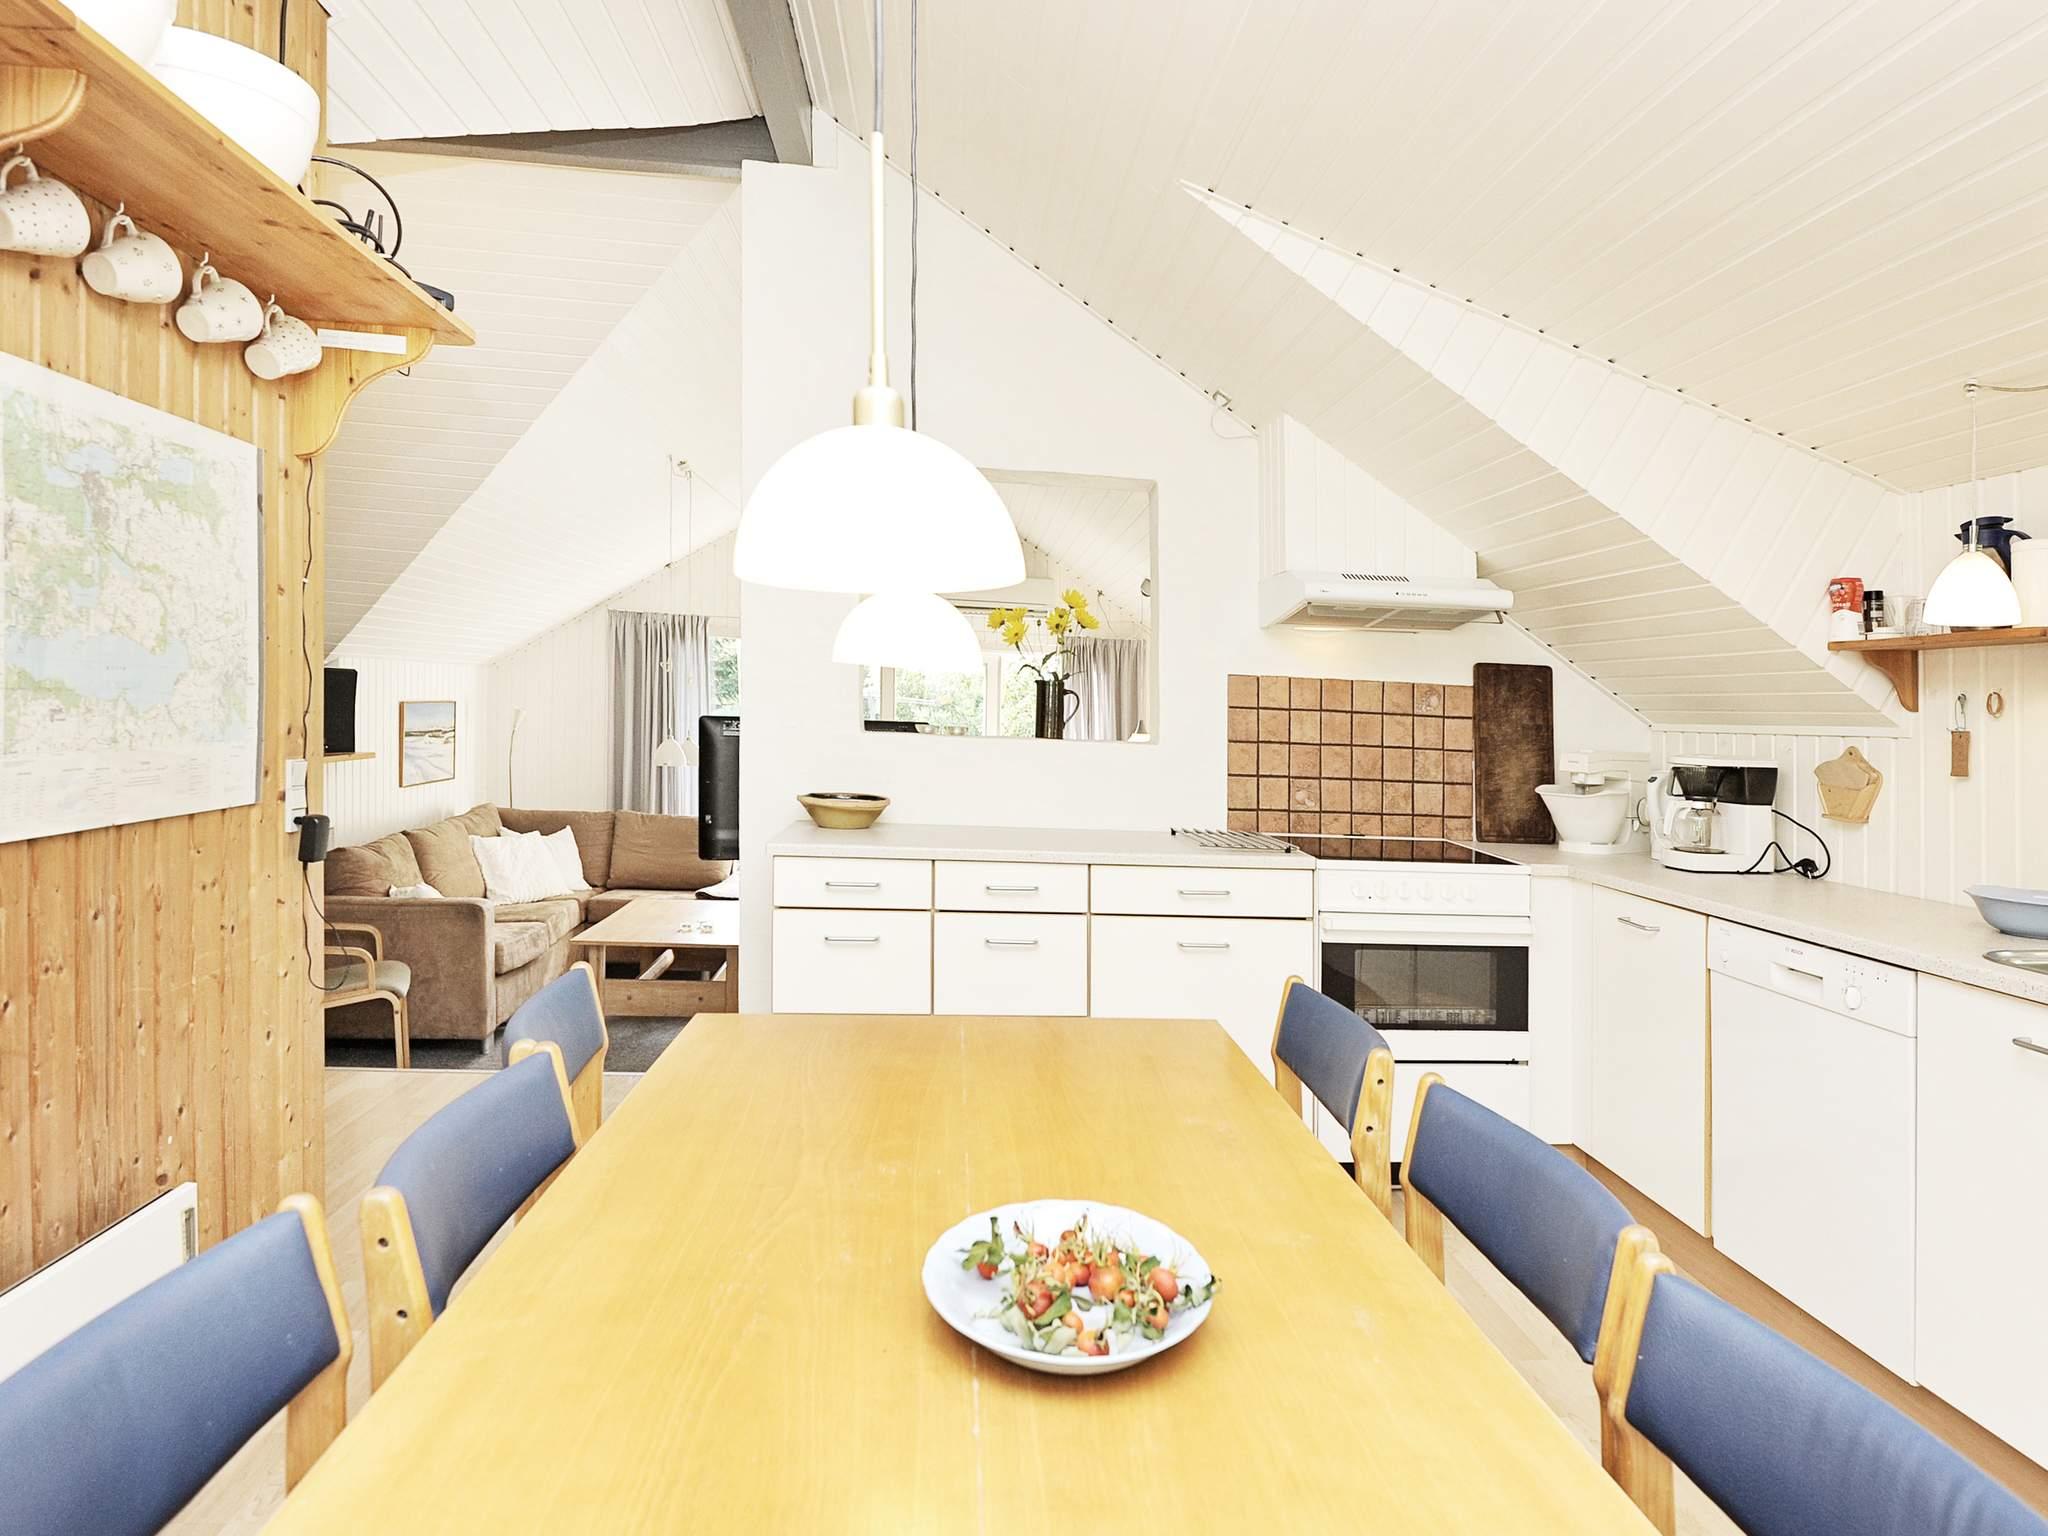 Ferienhaus Ry (83836), Ry, , Ostjütland, Dänemark, Bild 15